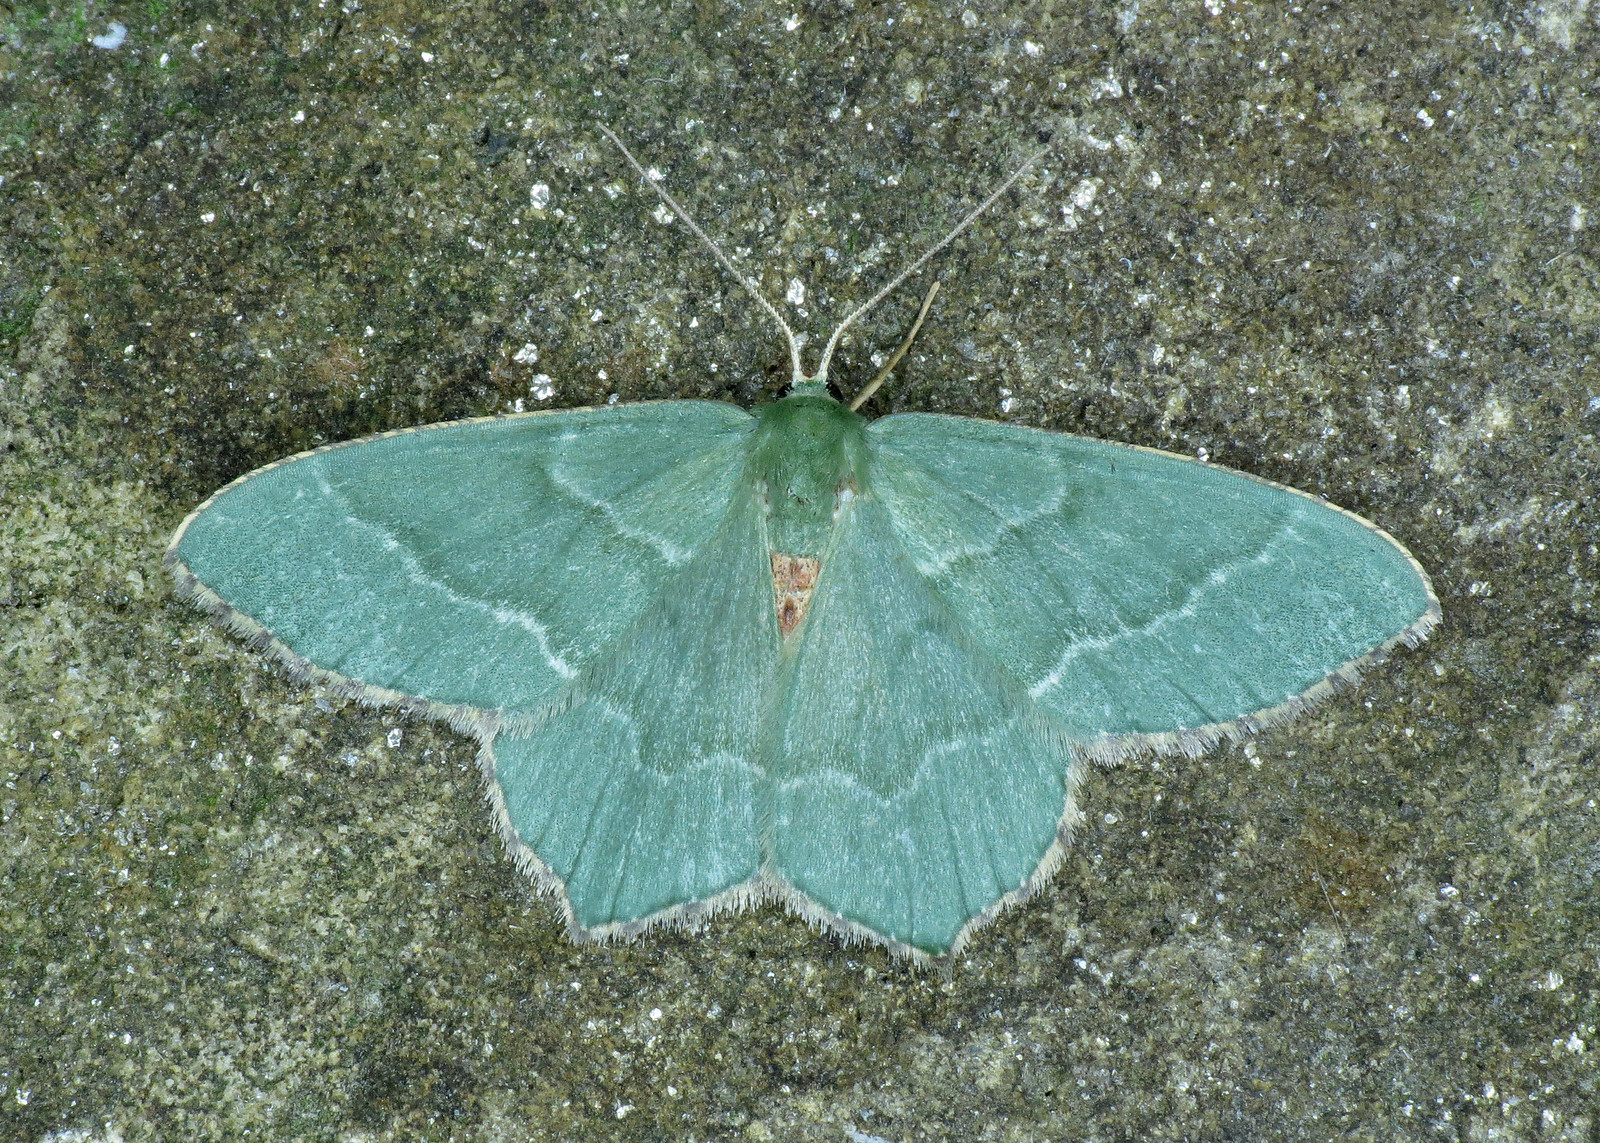 1669 Common Emerald - Hemithea aestivaria